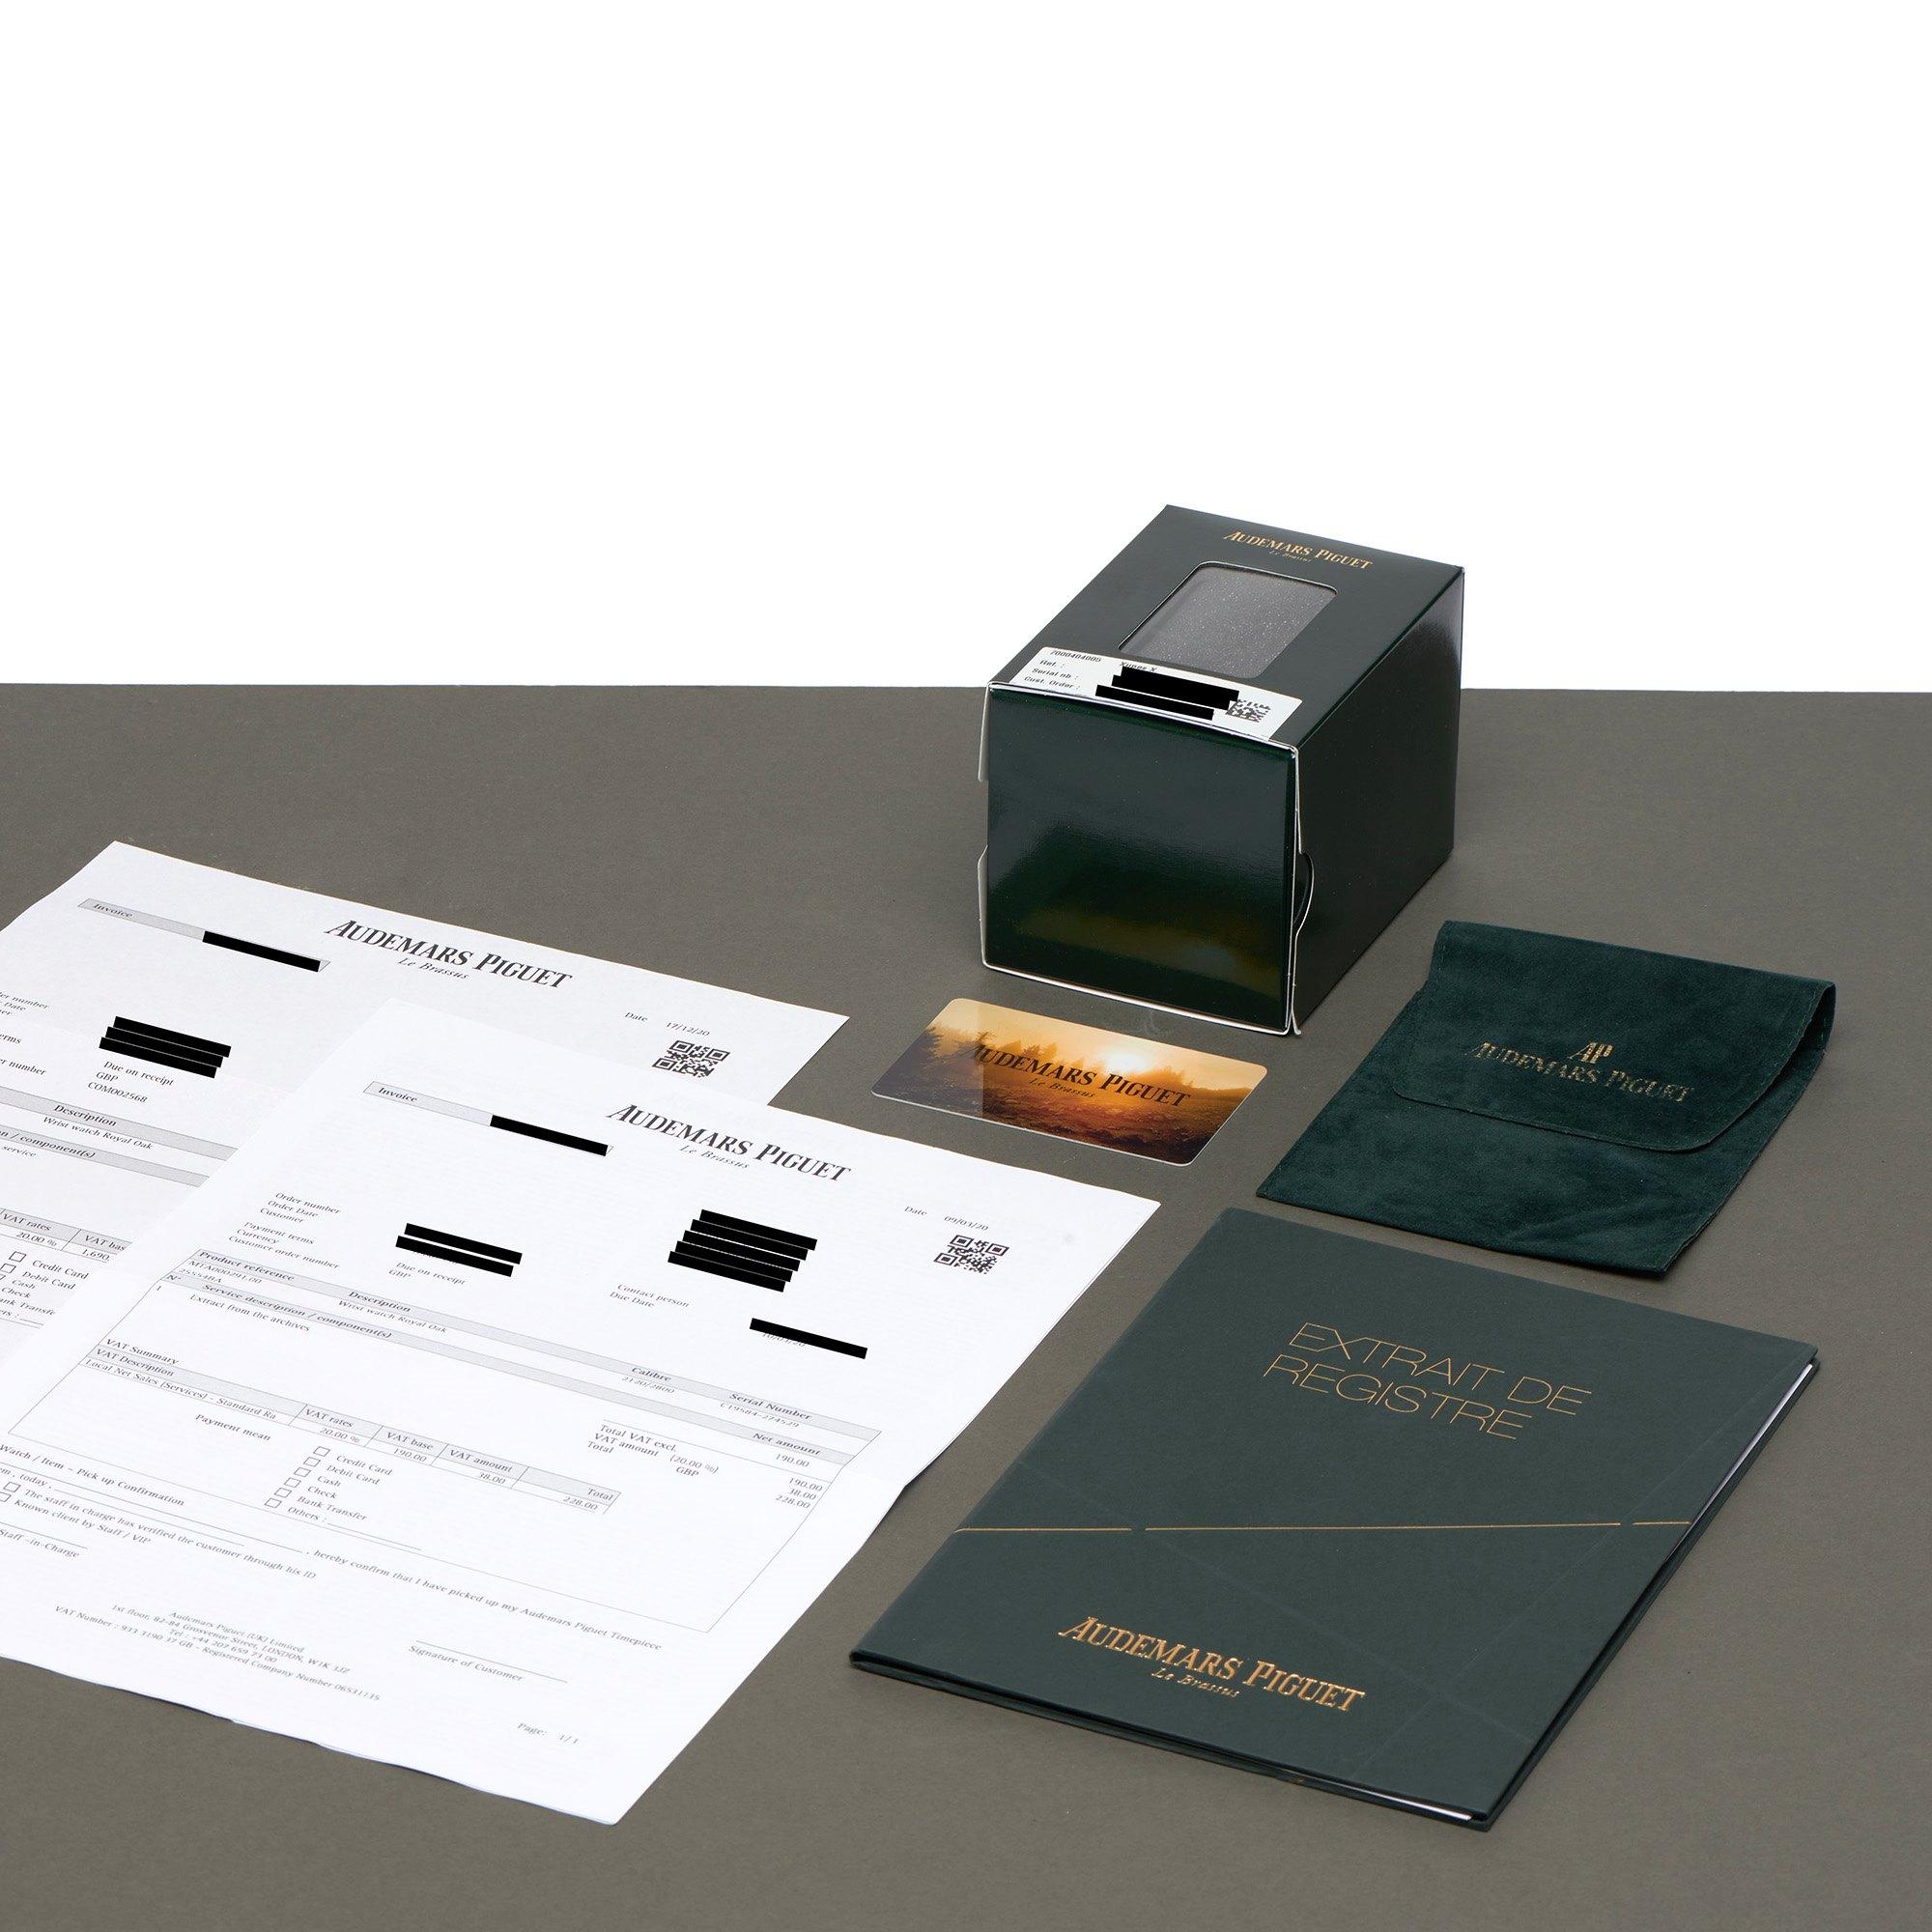 Audemars Piguet Royal Oak Perpetual Calendar MKI Dial 18K Yellow Gold - 25554BA Yellow Gold 25554BA